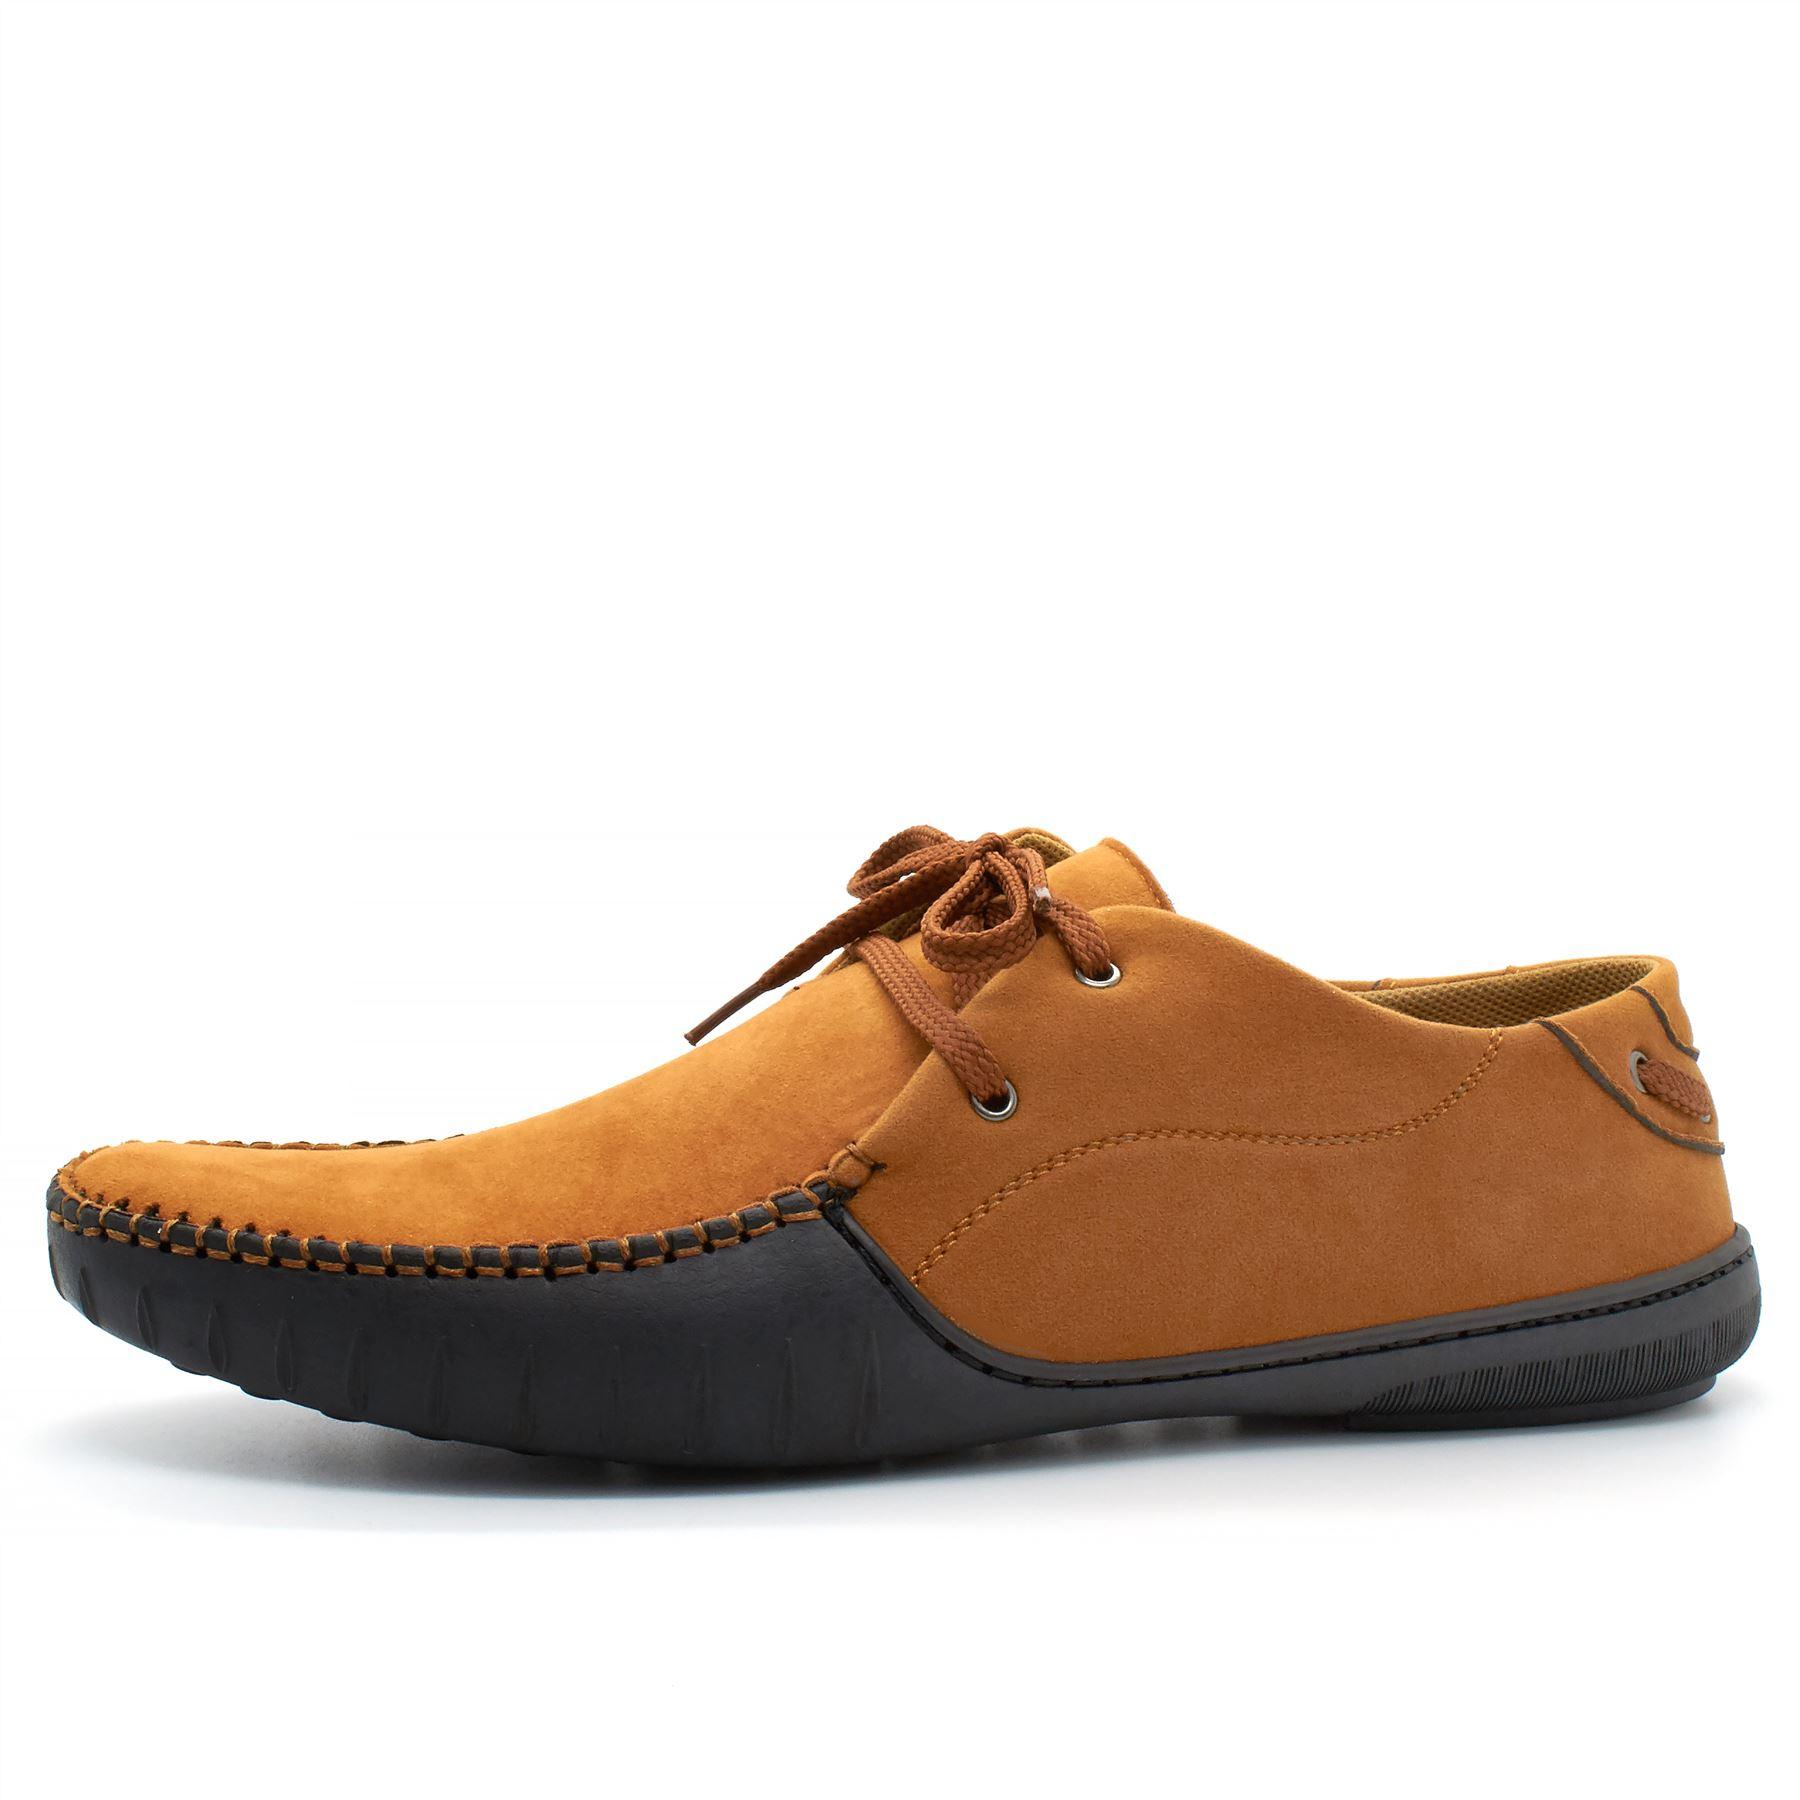 New Mens Casual Loafers Designer Tassel Slip On Shoes Boat